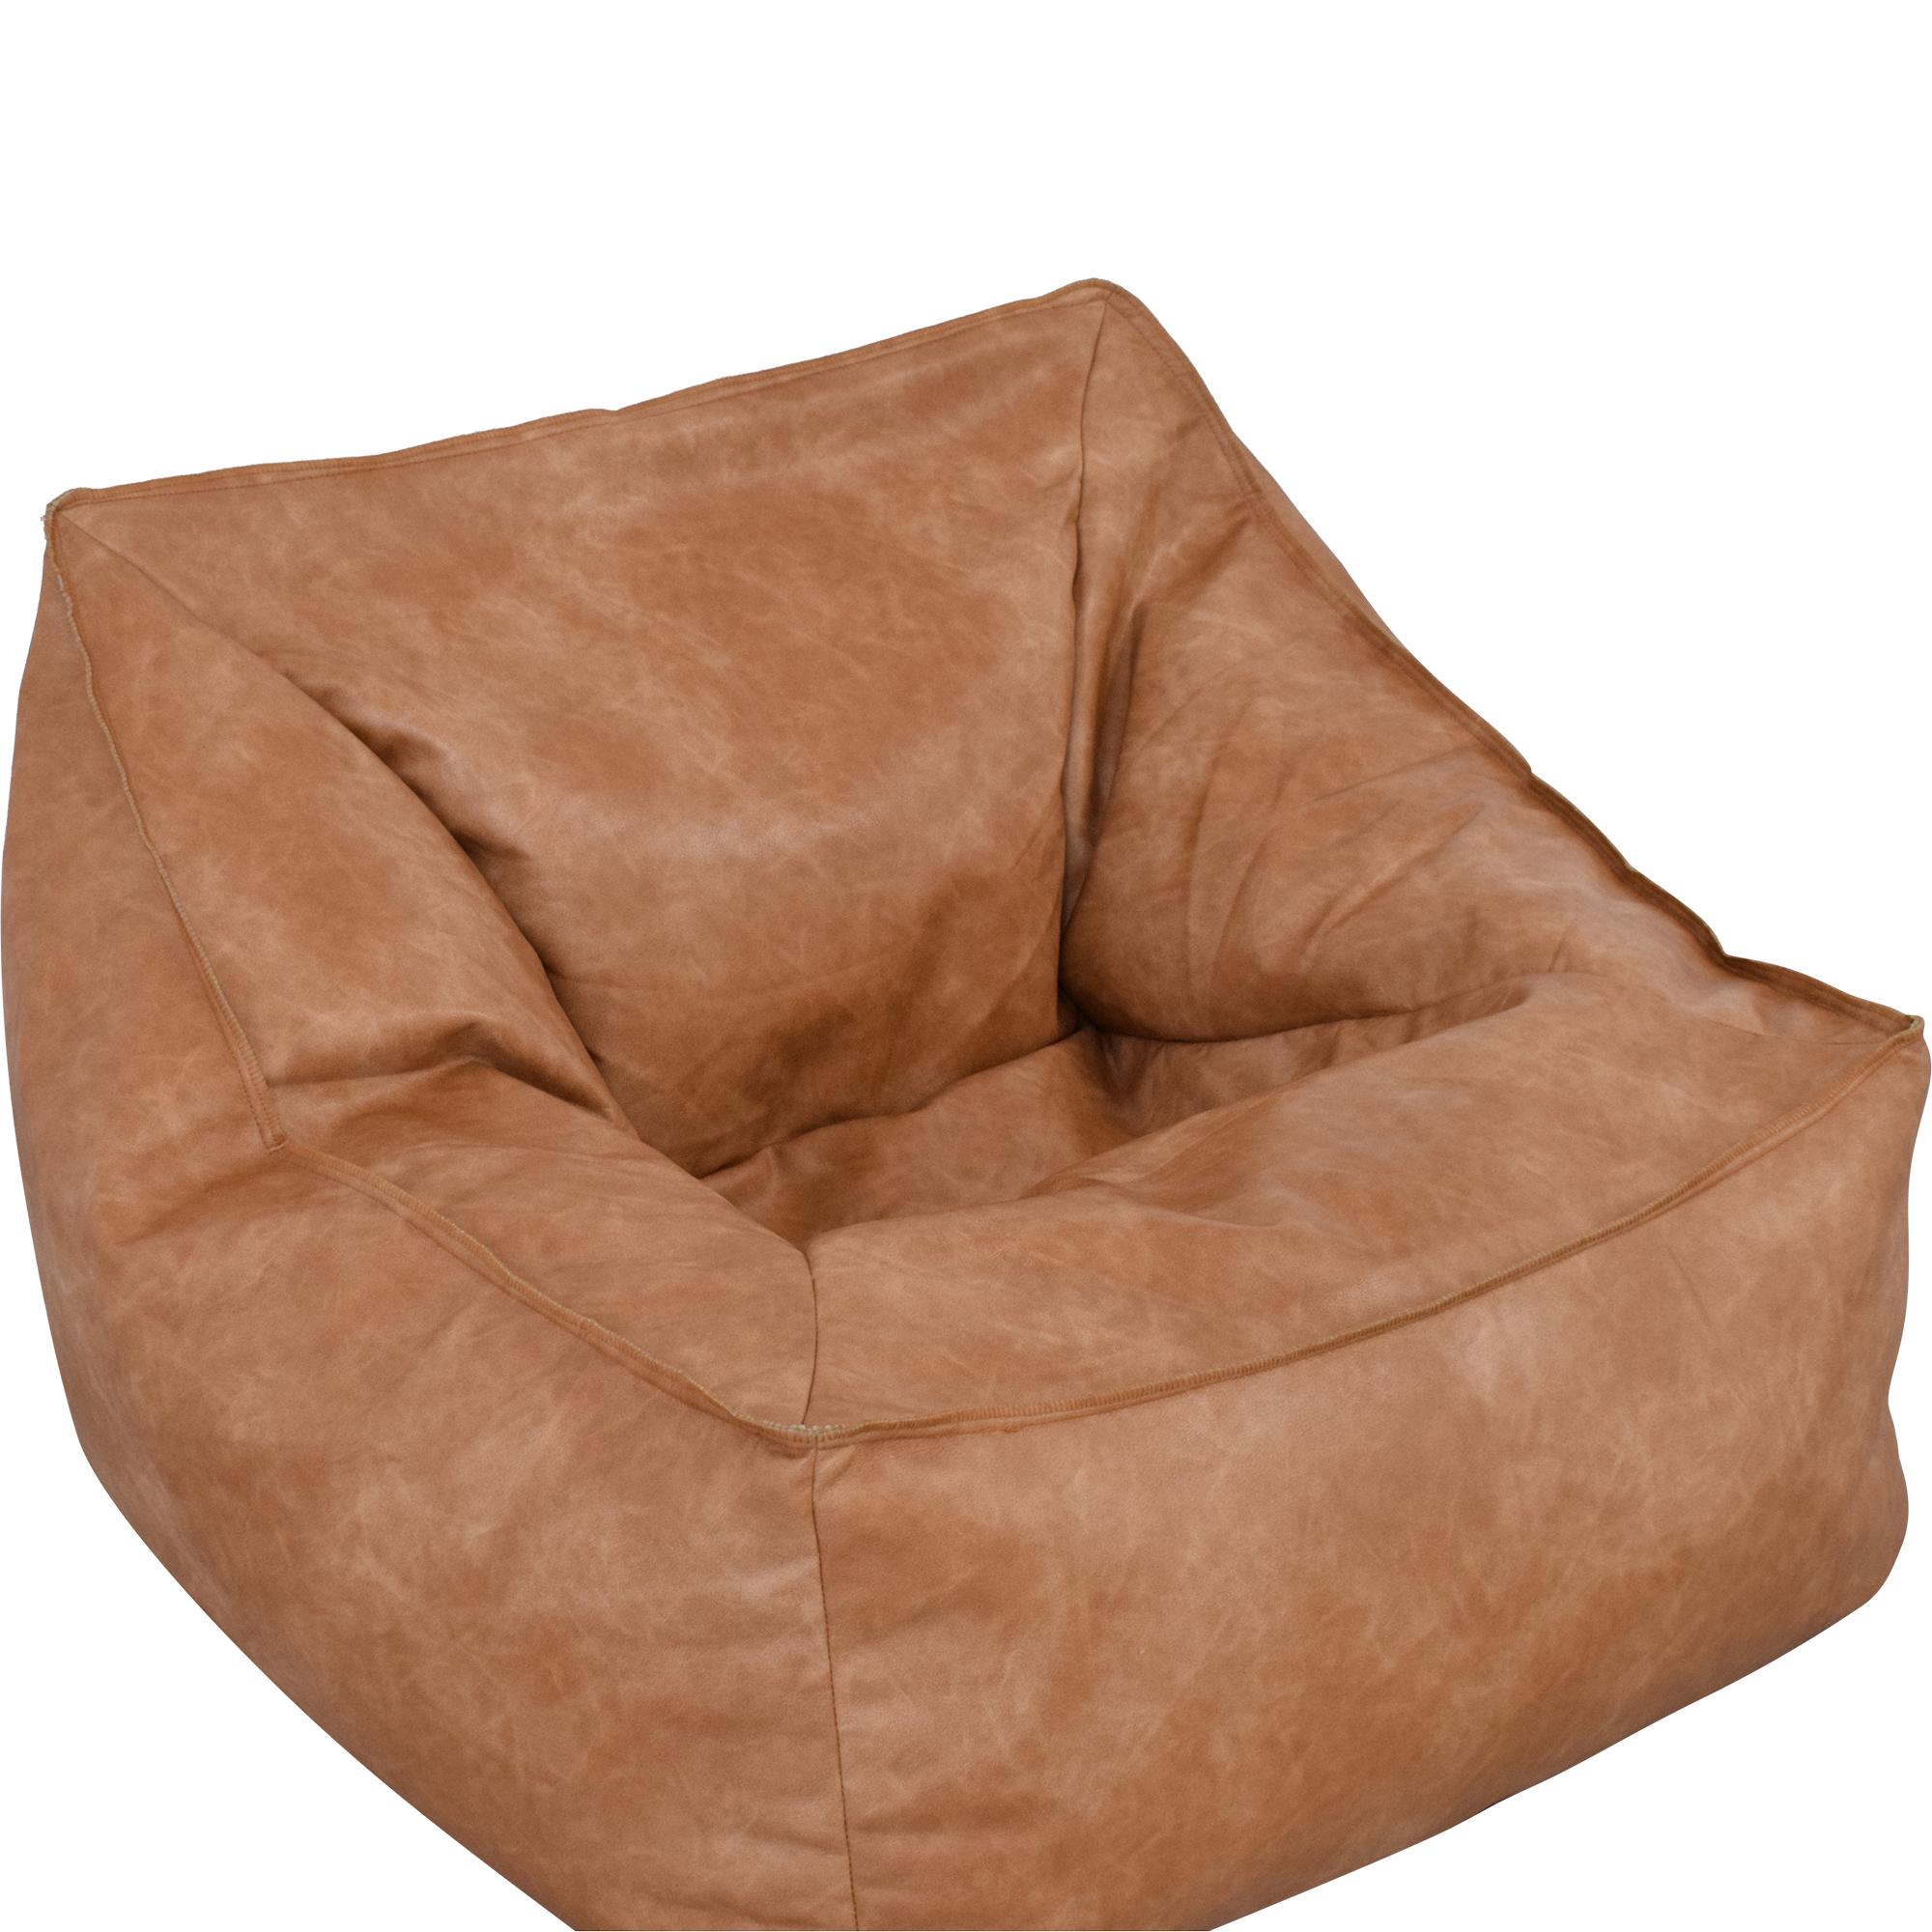 Pottery Barn Teen Pottery Barn Teen Modern Lounger Chairs